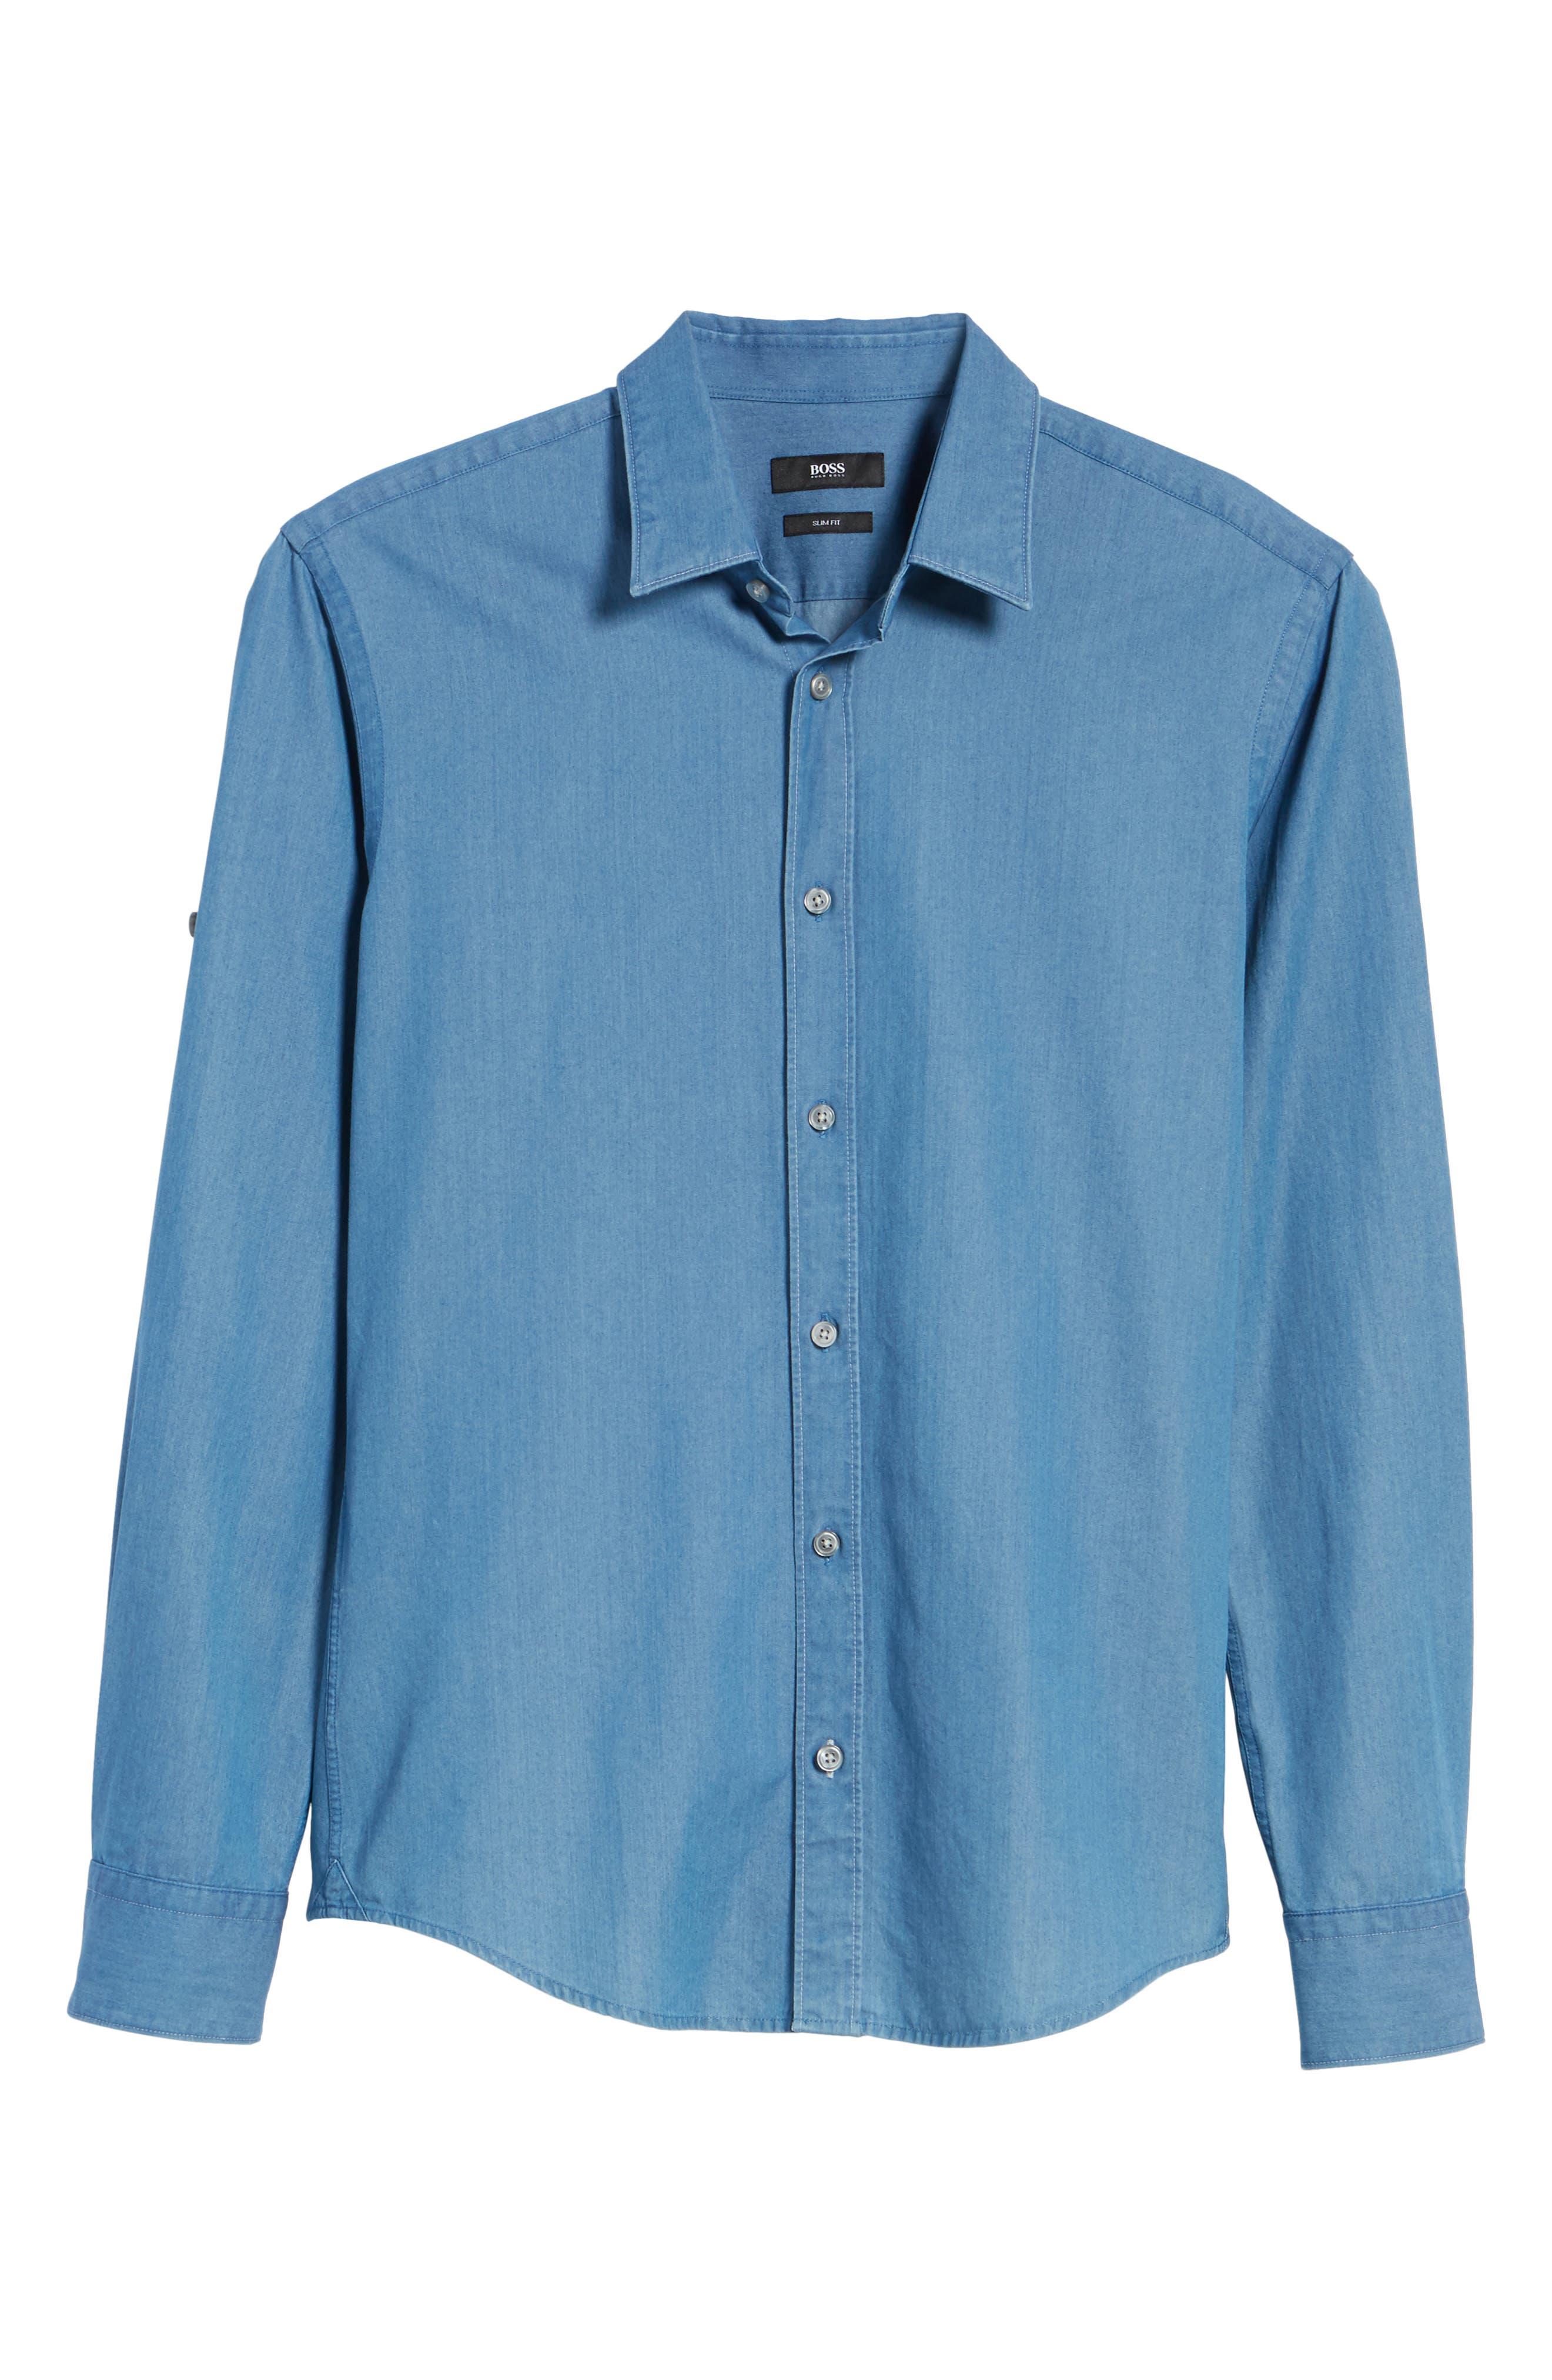 Reid Denim Sport Shirt,                             Alternate thumbnail 5, color,                             Blue